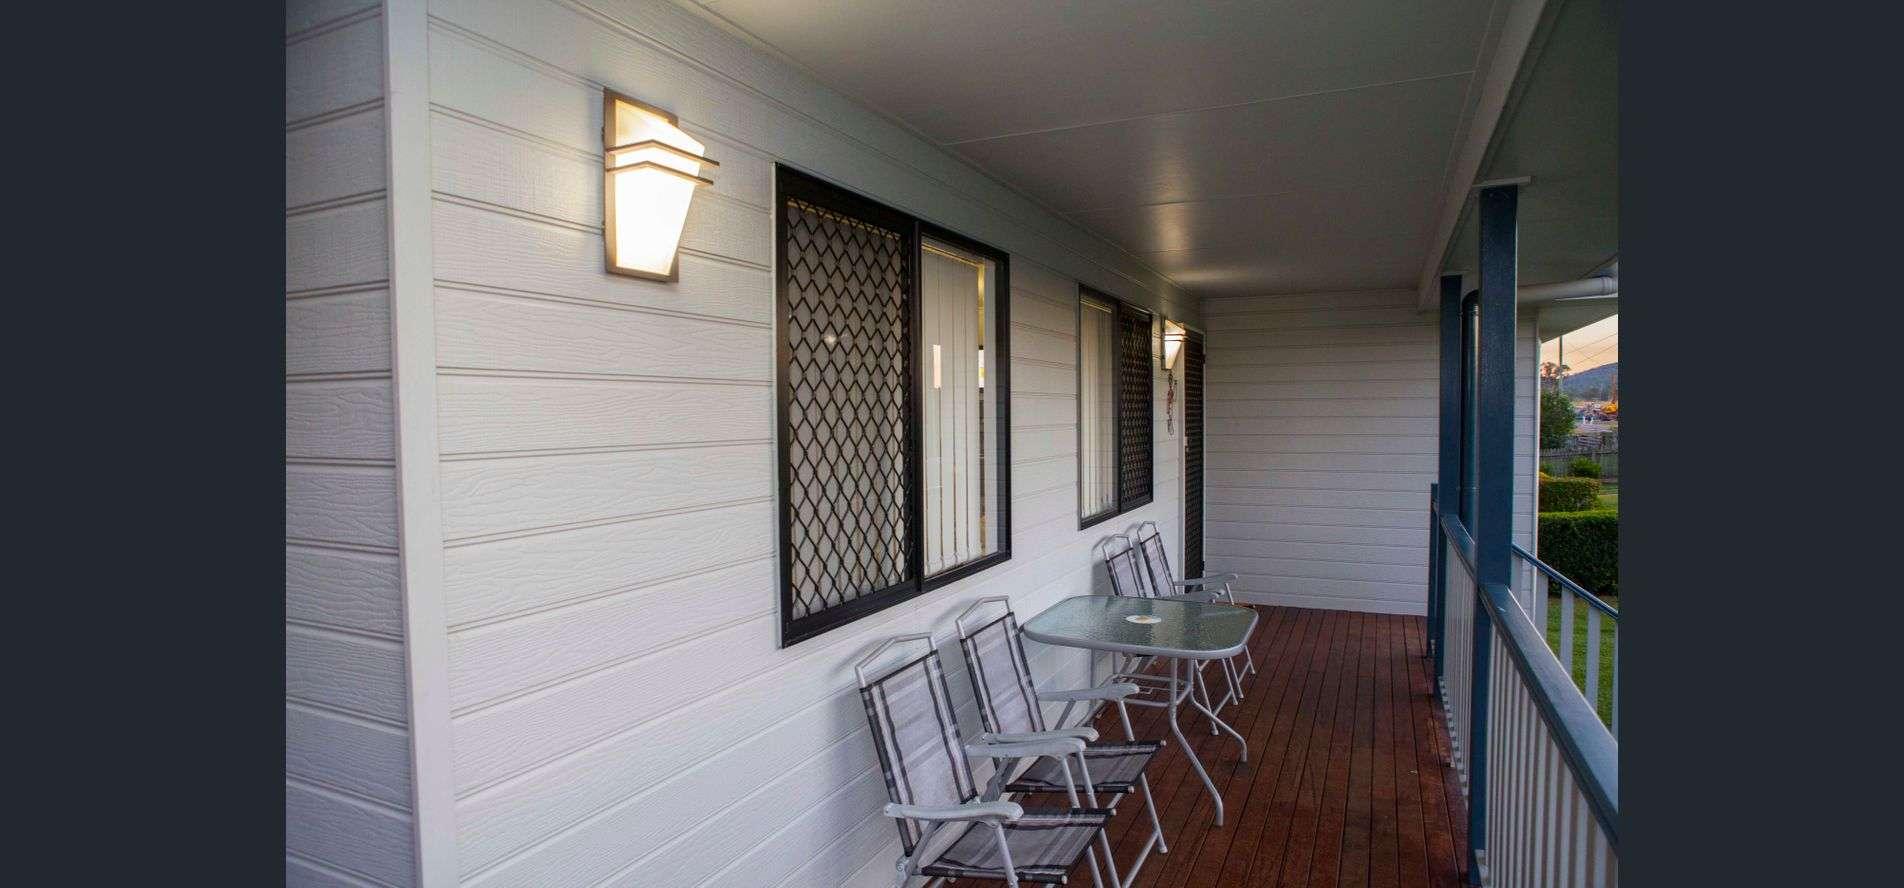 14 Copenhagen Street, Tiaro, QLD 4650